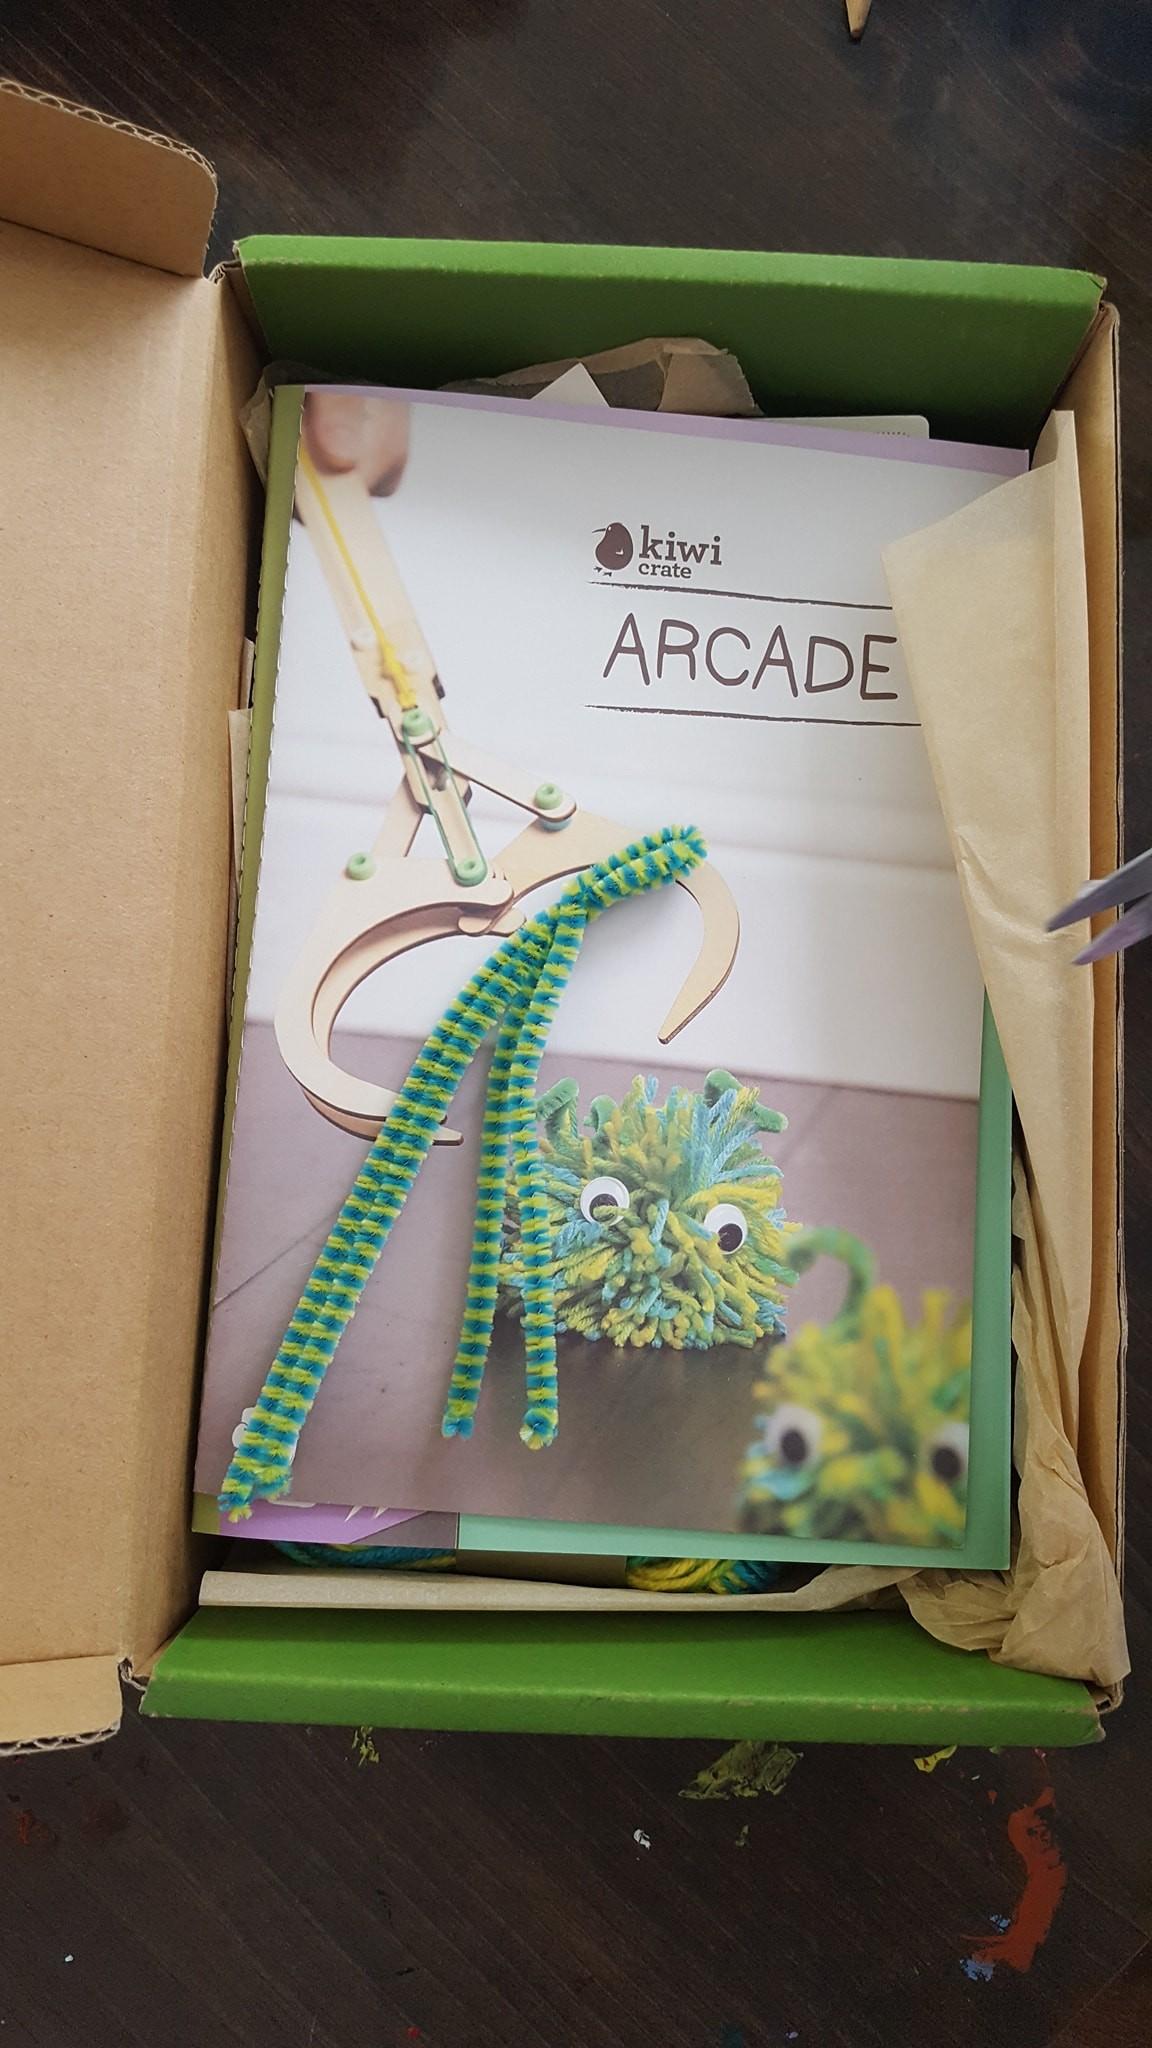 KiwiCo | Hands-on science and art projects |Kiwi Arcade